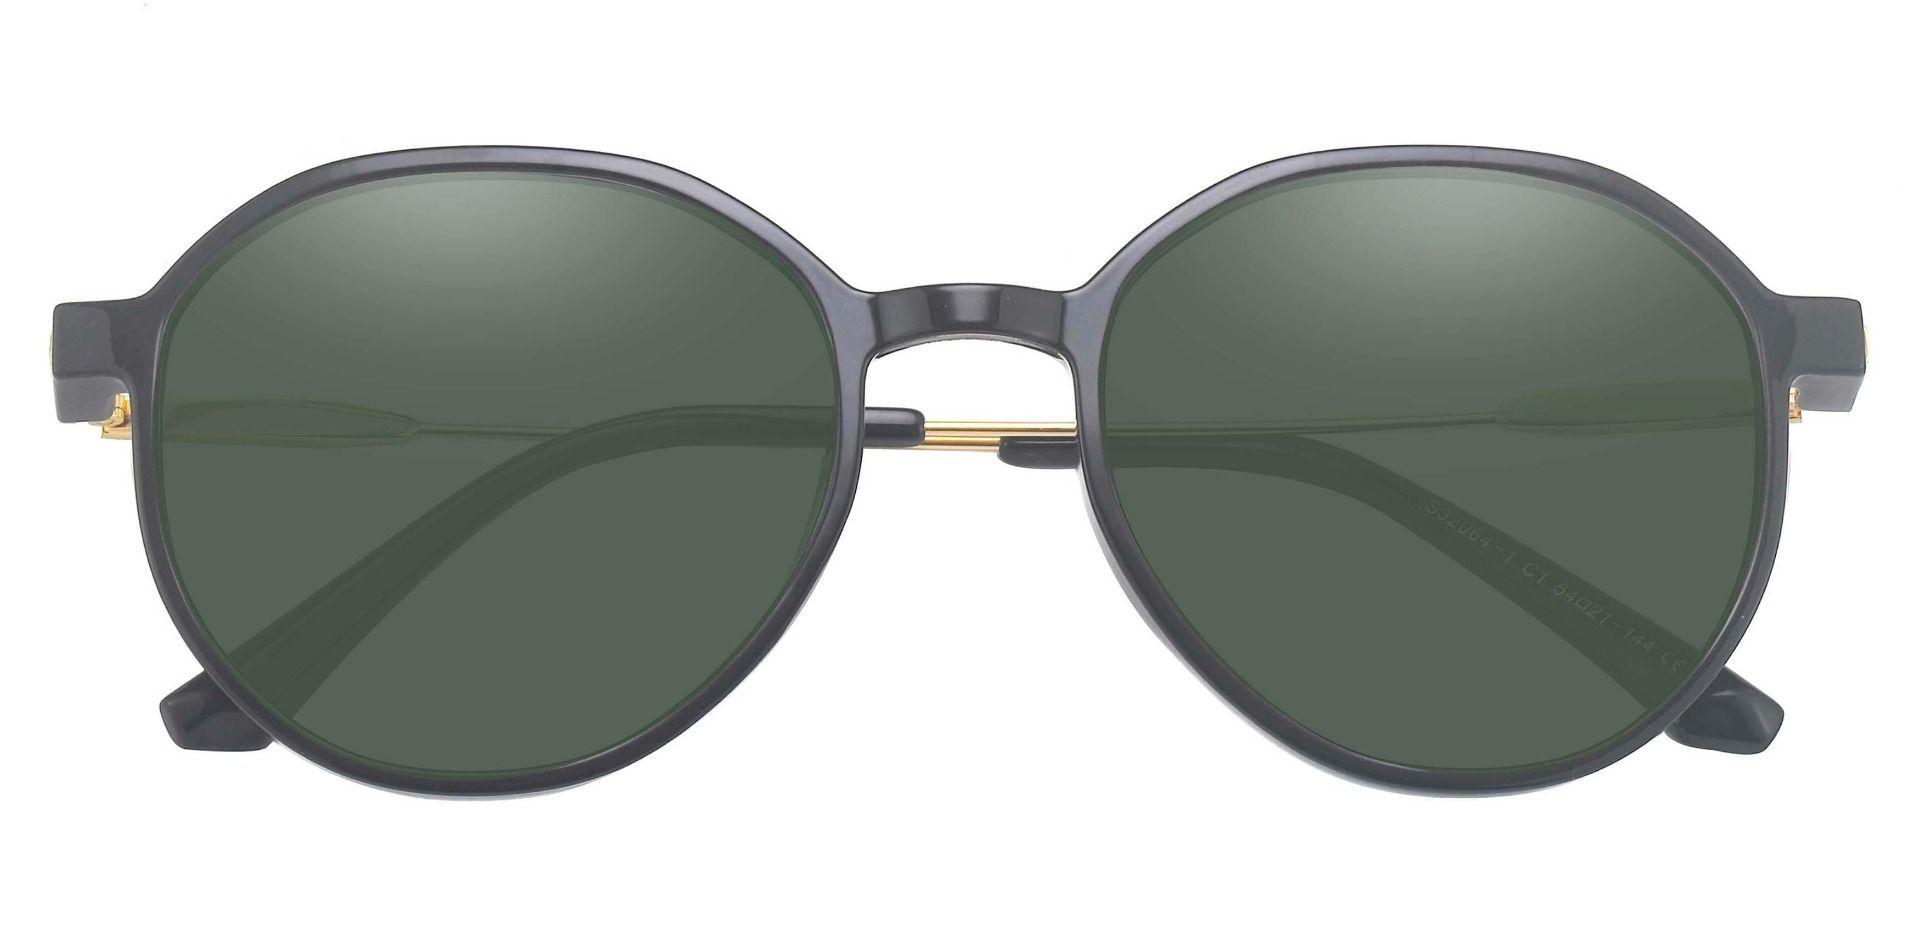 Daytona Geometric Lined Bifocal Sunglasses - Black Frame With Green Lenses